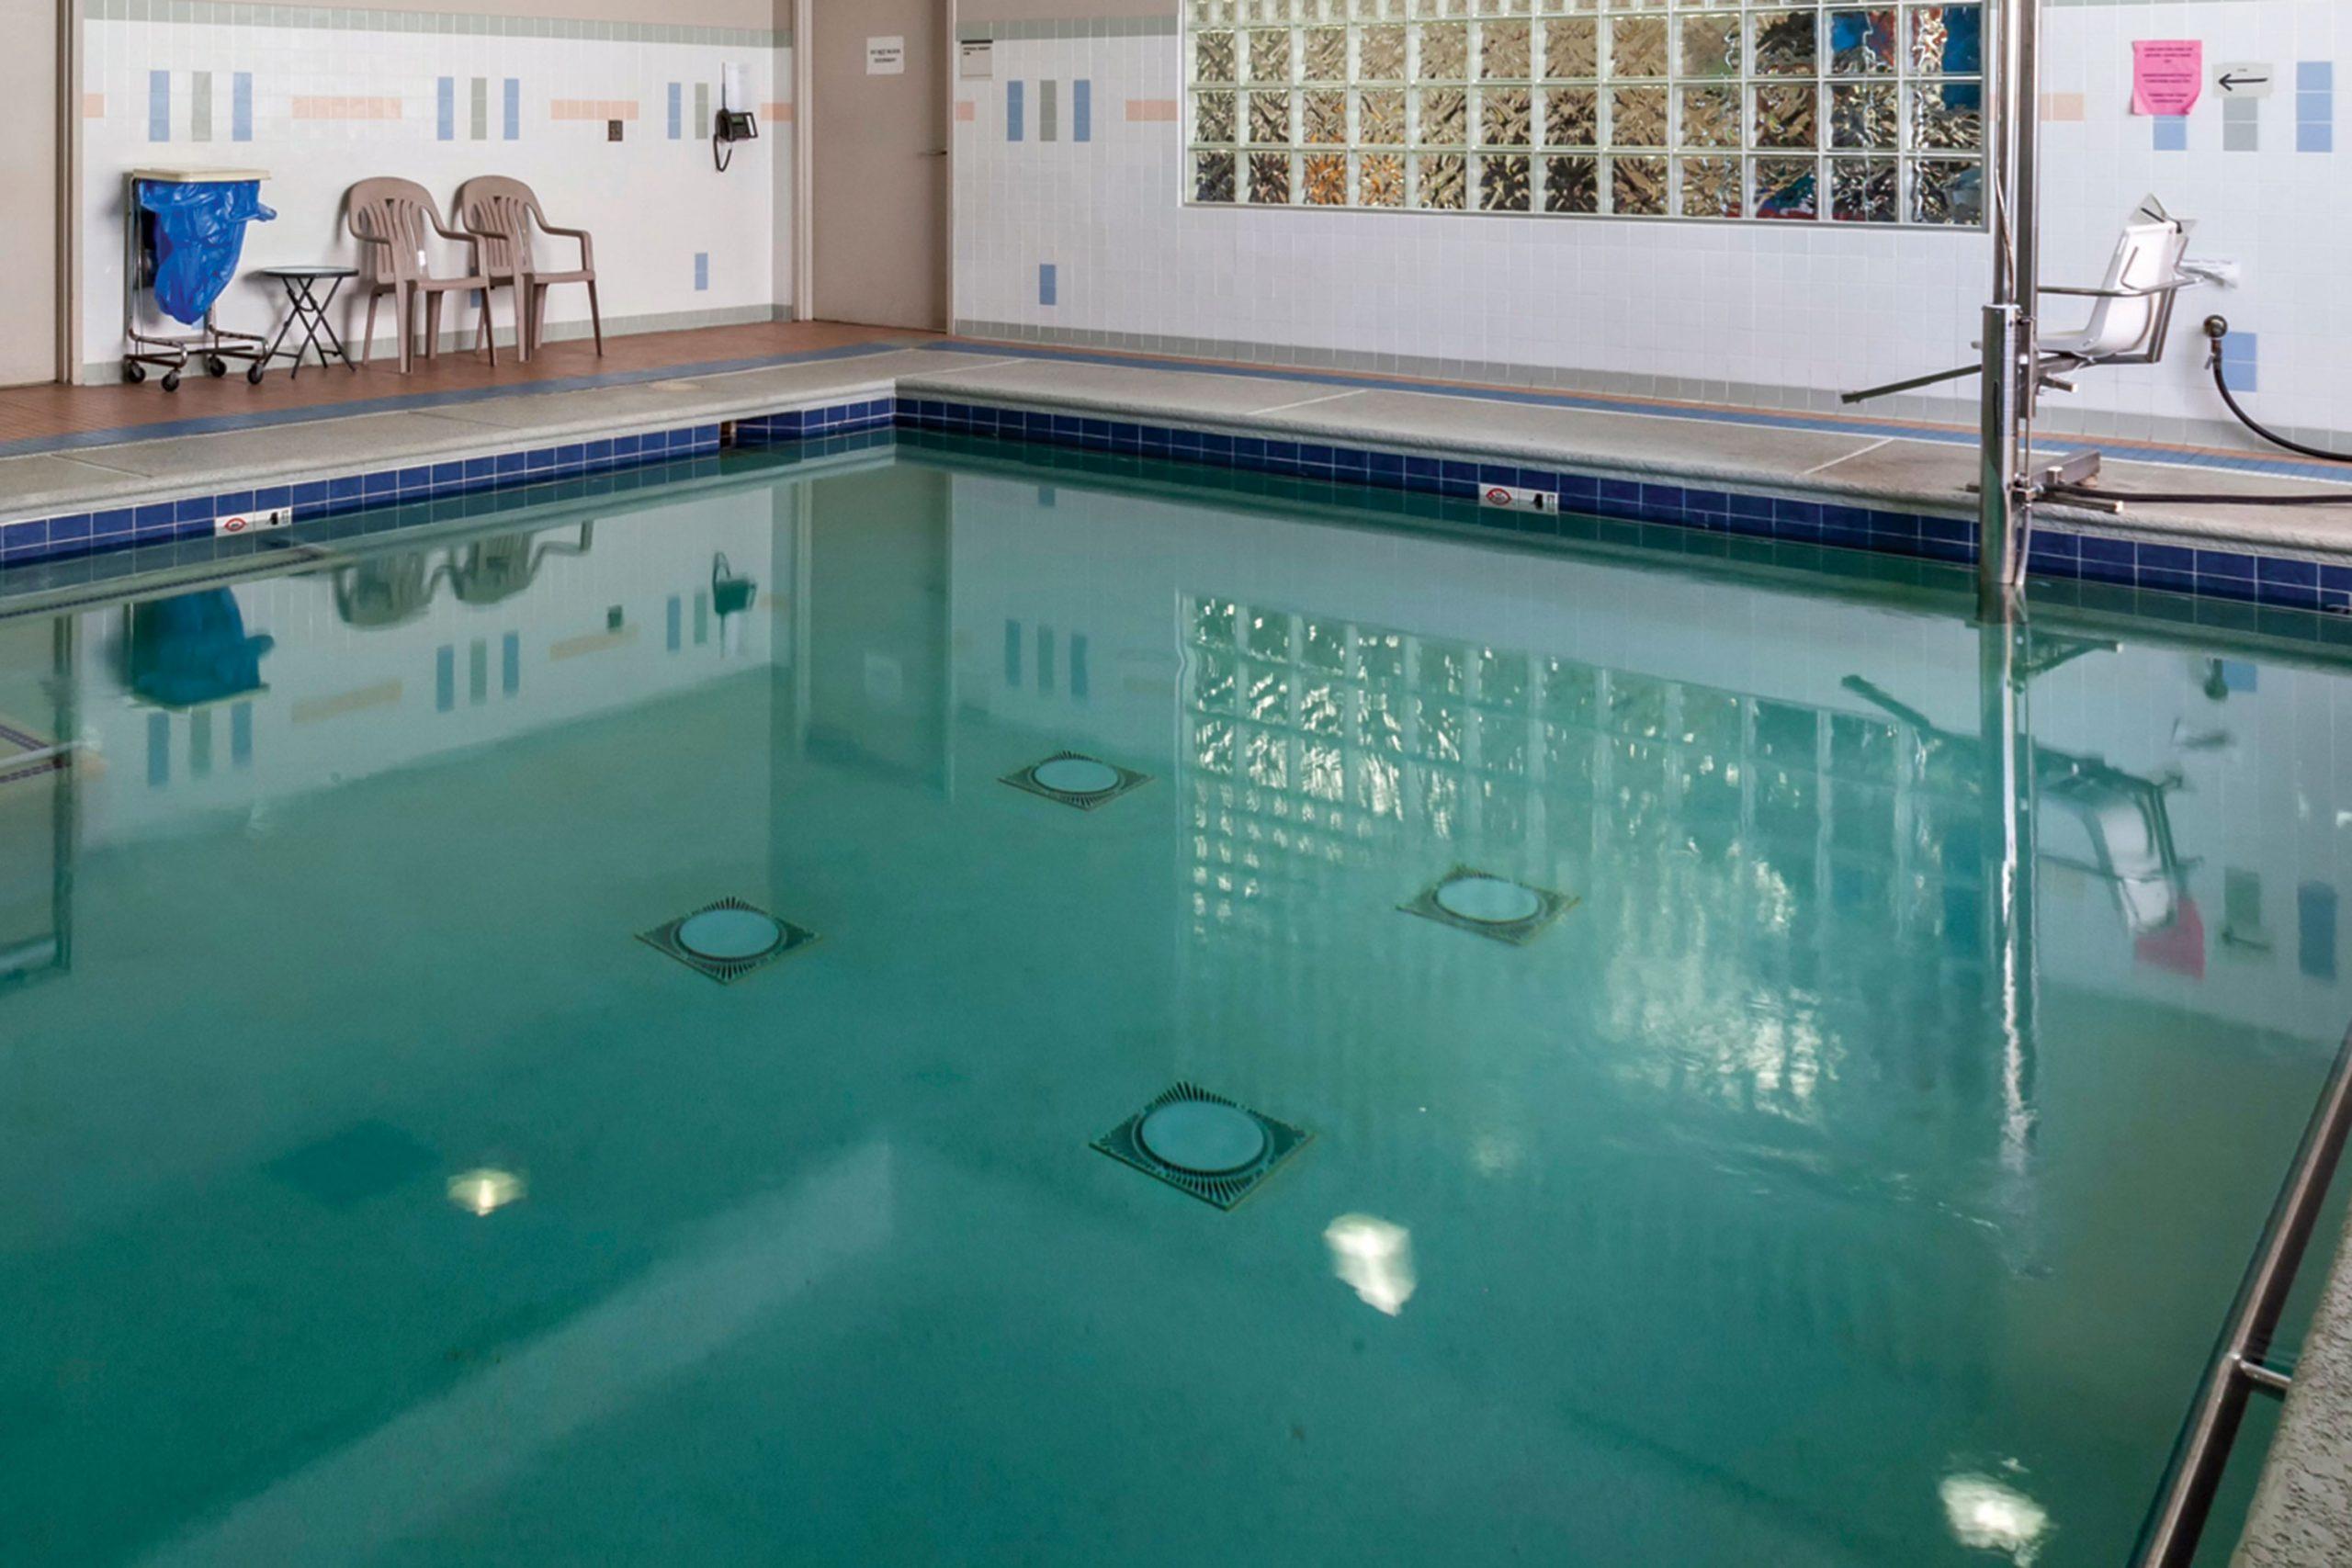 Therapeutic Pool at Encompass Health Rehabilitation Hospital of Scottsdale; Photo courtesy Encompass Health Rehabilitation Hospital